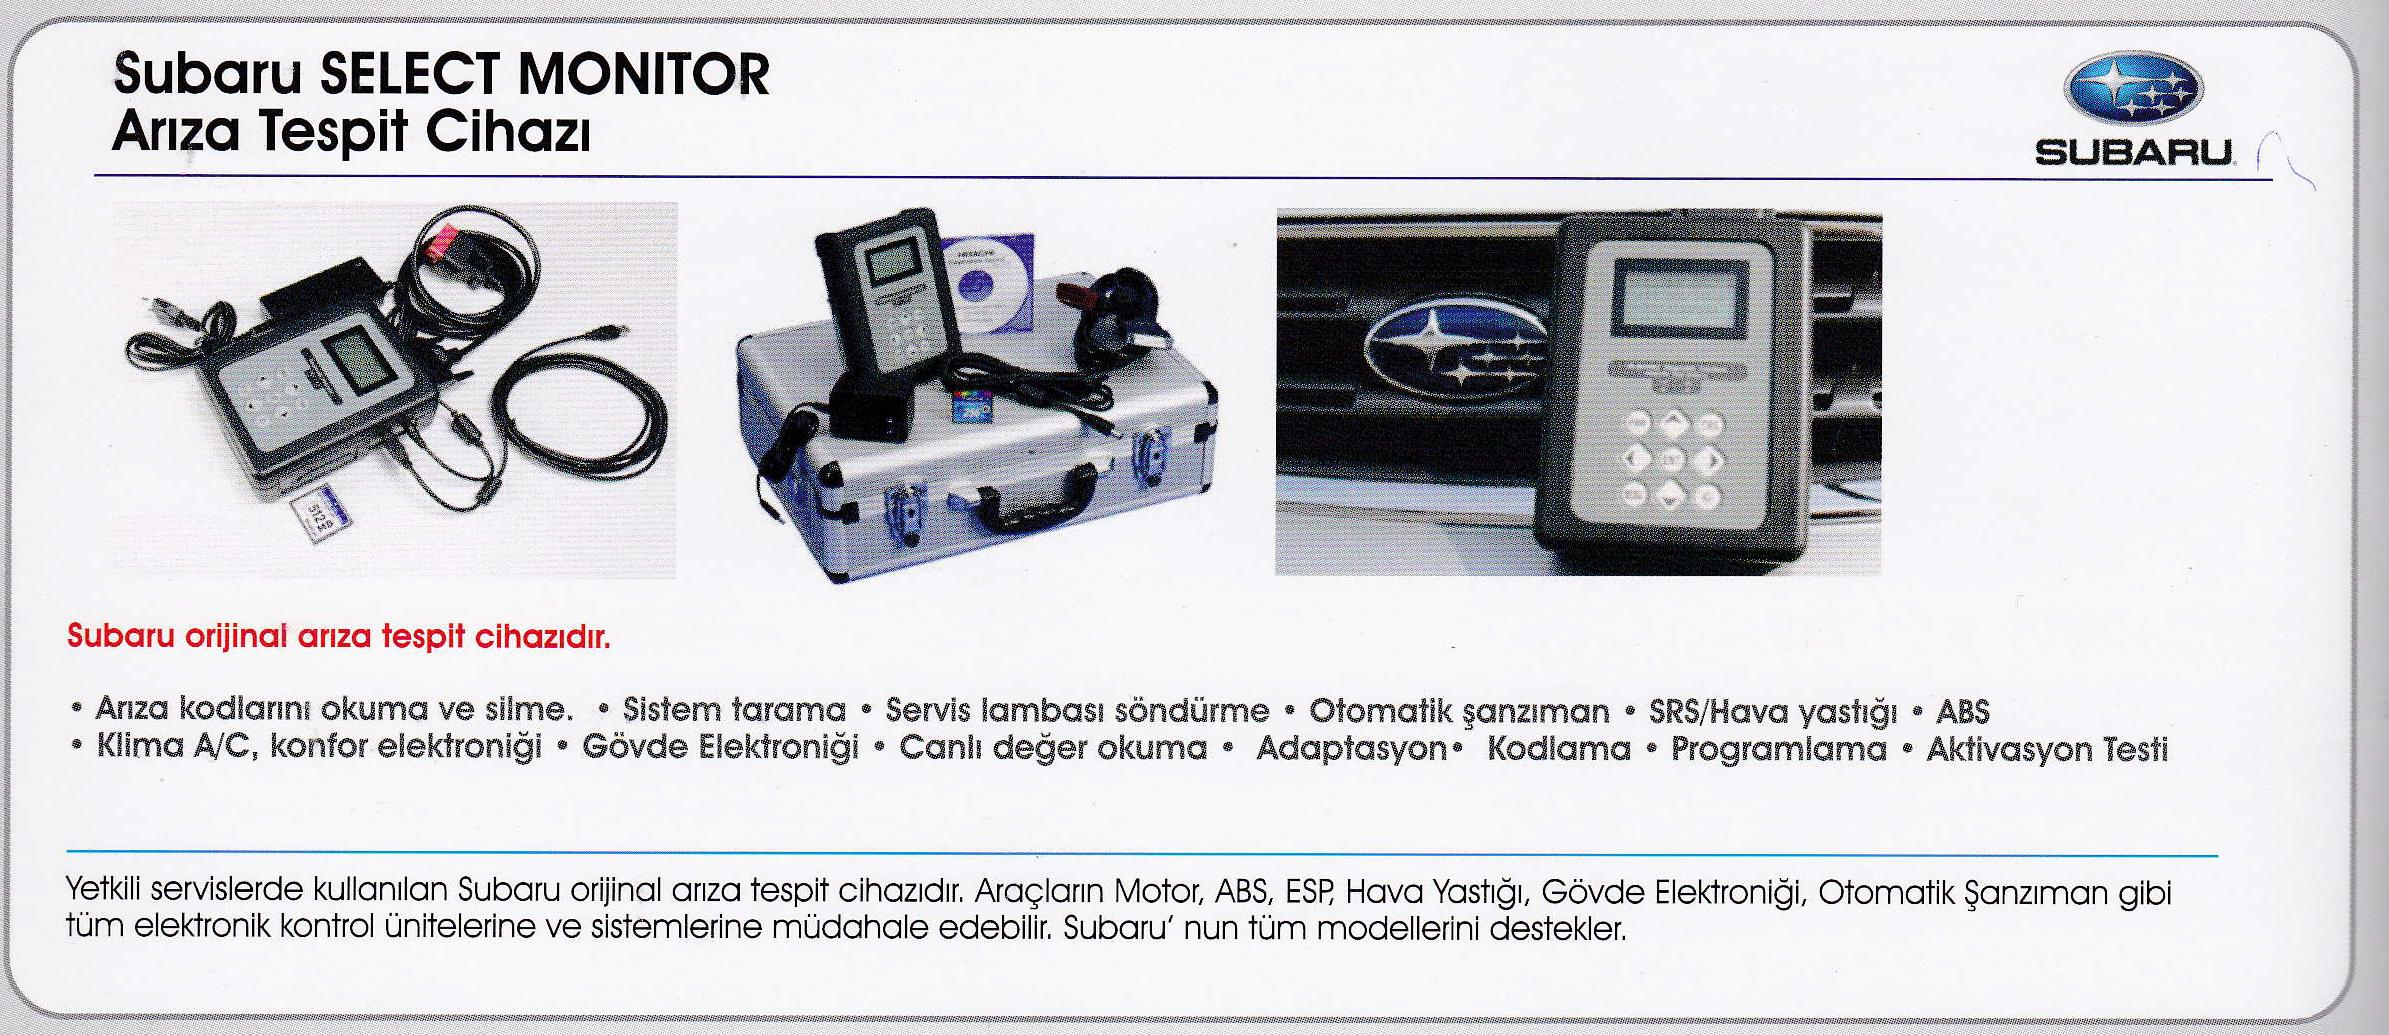 SUBARU SELECT MONITOR 3 ARIZA TESPİT CİHAZI | Ağır Vasıta